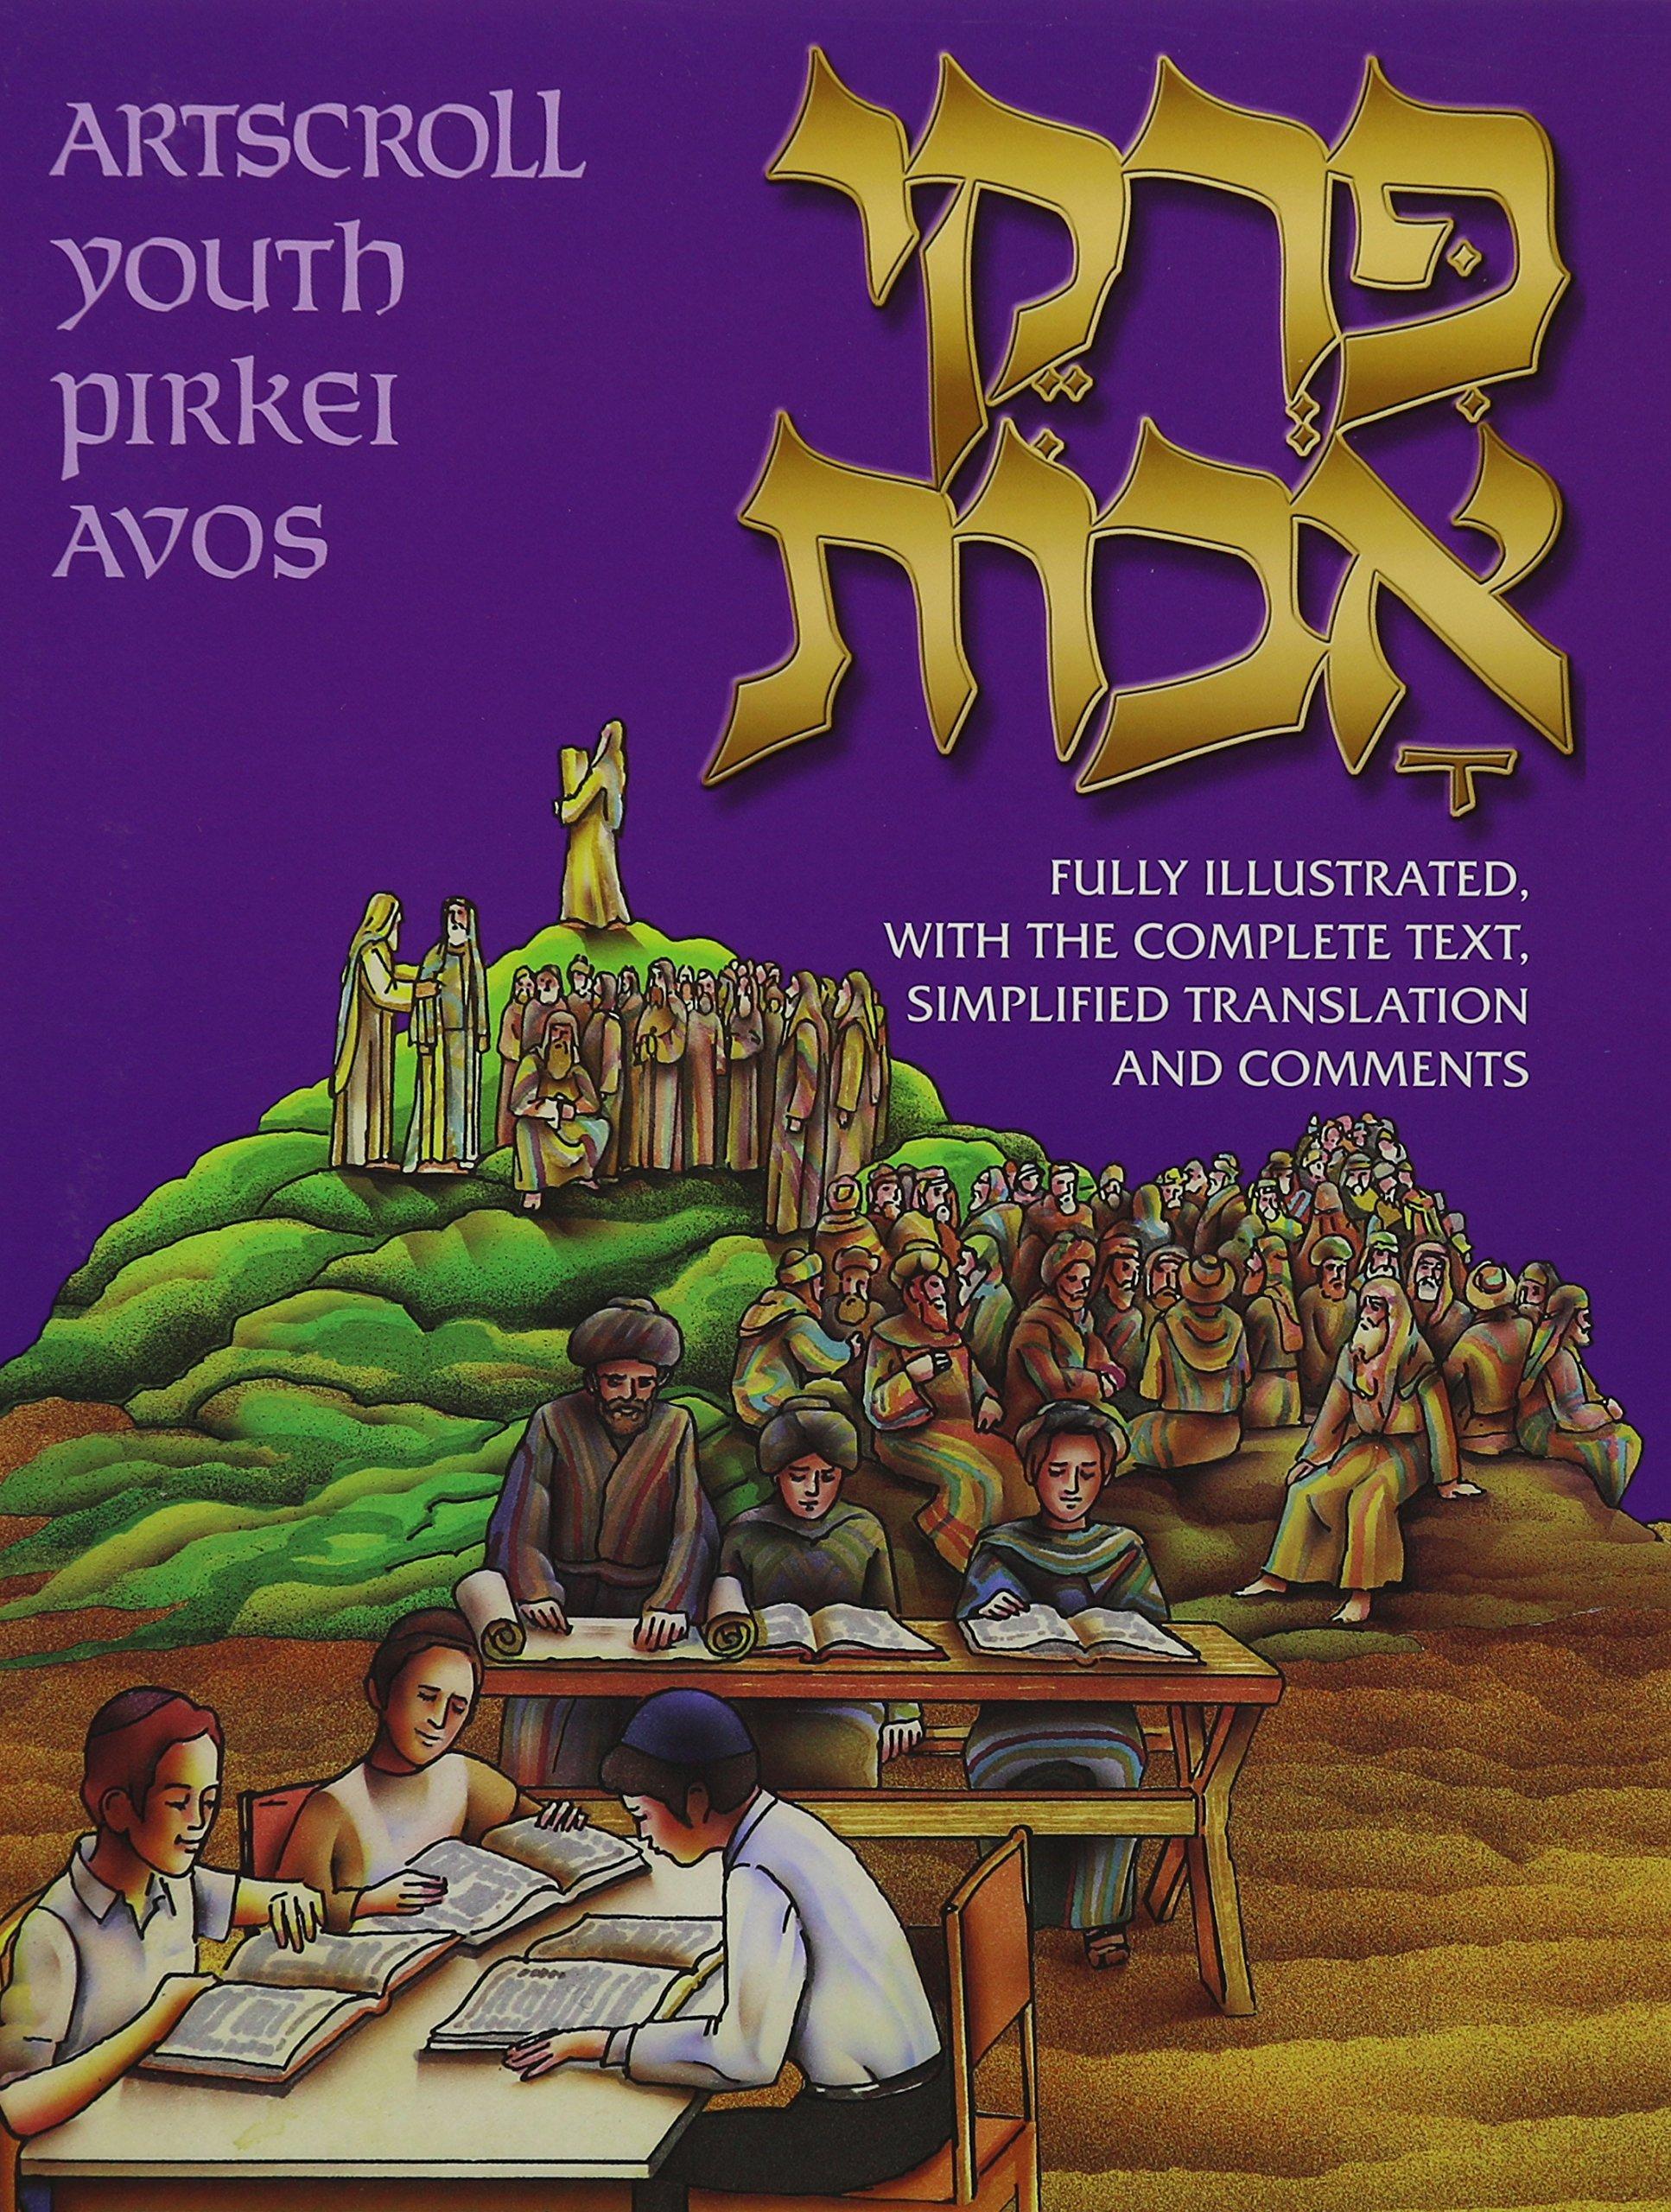 Artscroll Youth Pirkel Avos